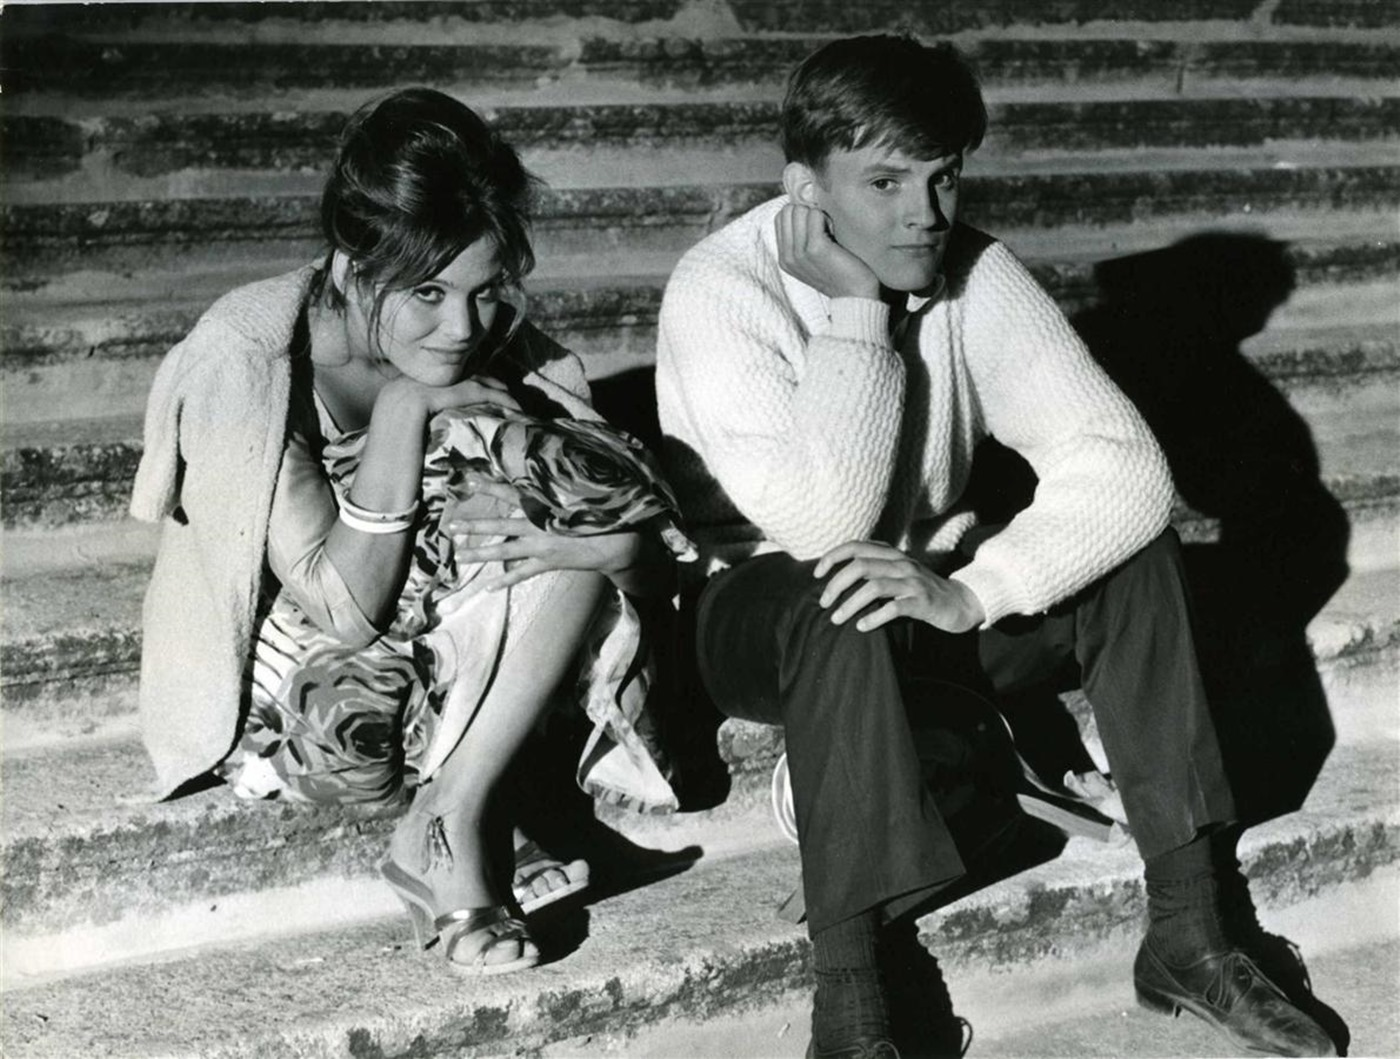 The forgotten films of Valerio Zurlini